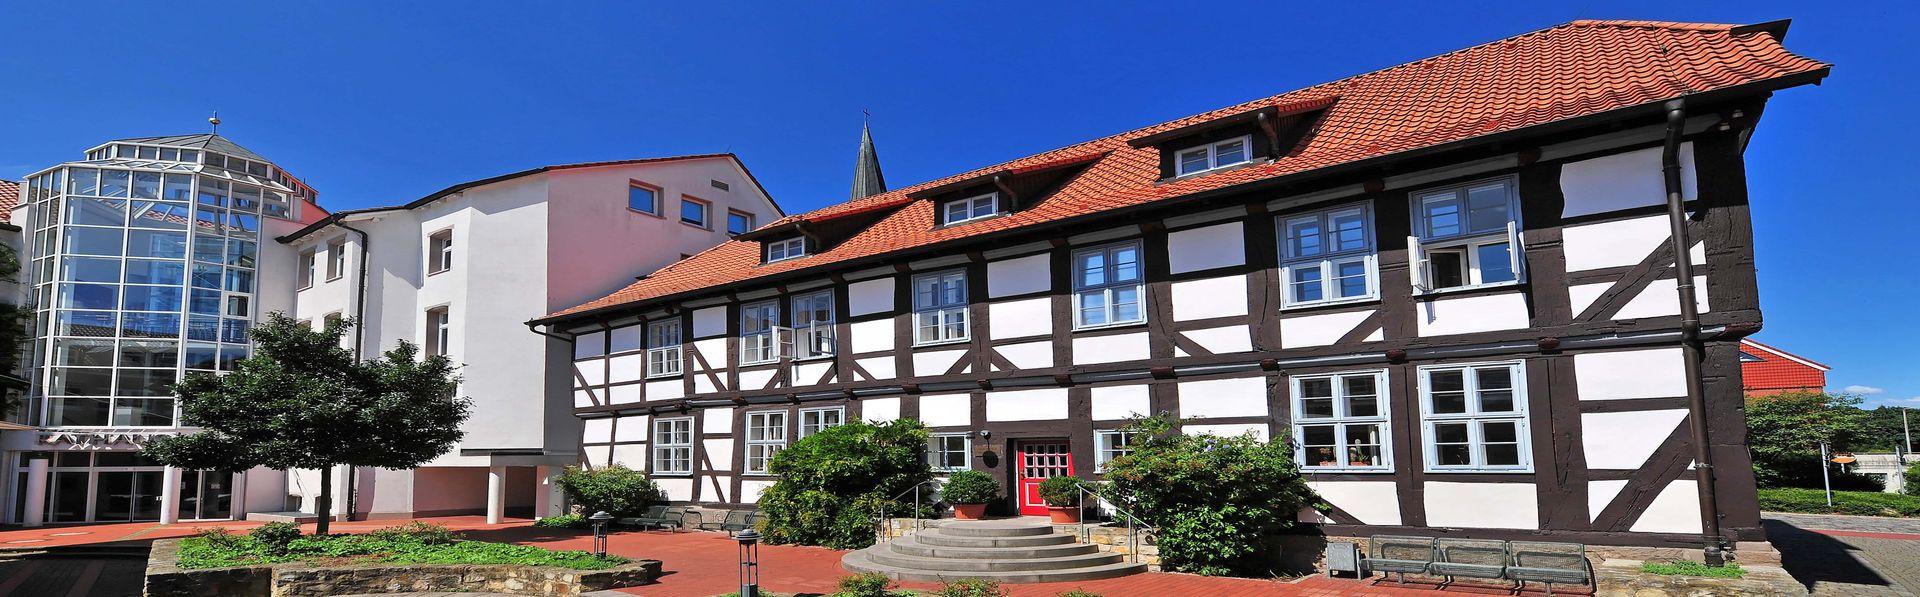 Rathaus & Politik 2